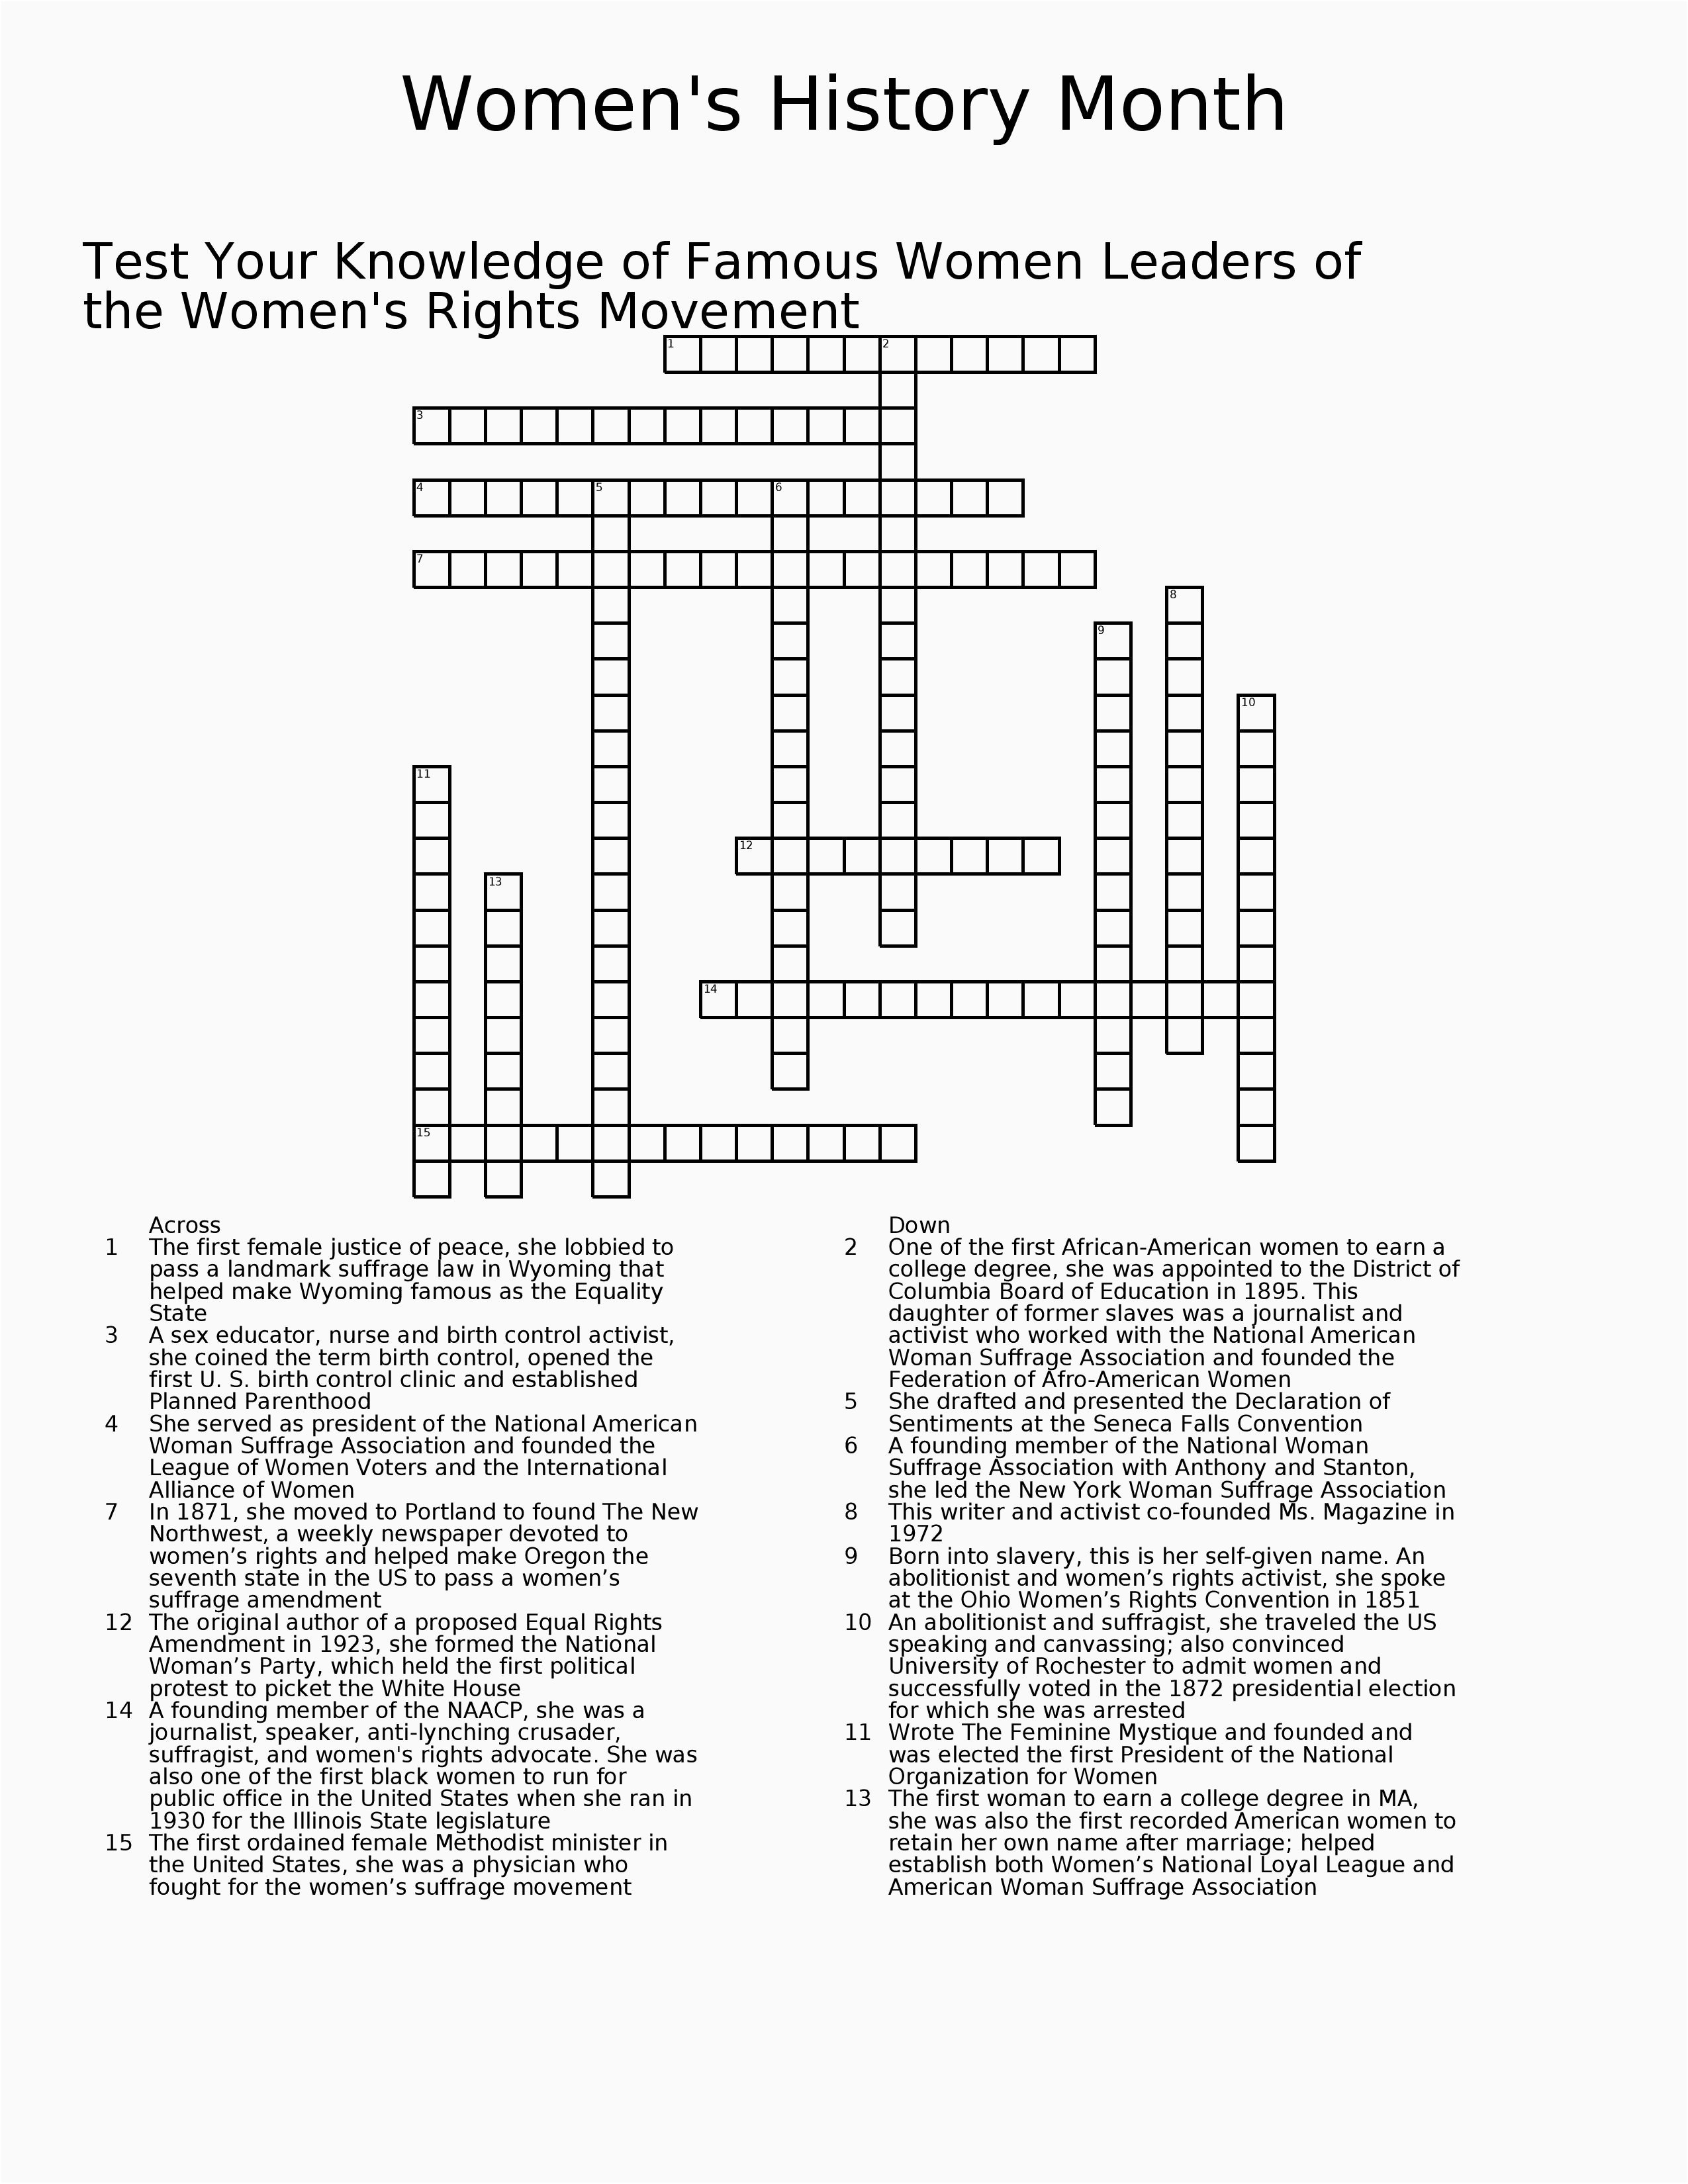 Black History Crossword Puzzle Printable – Open-Source-Design - Black History Crossword Puzzle Printable